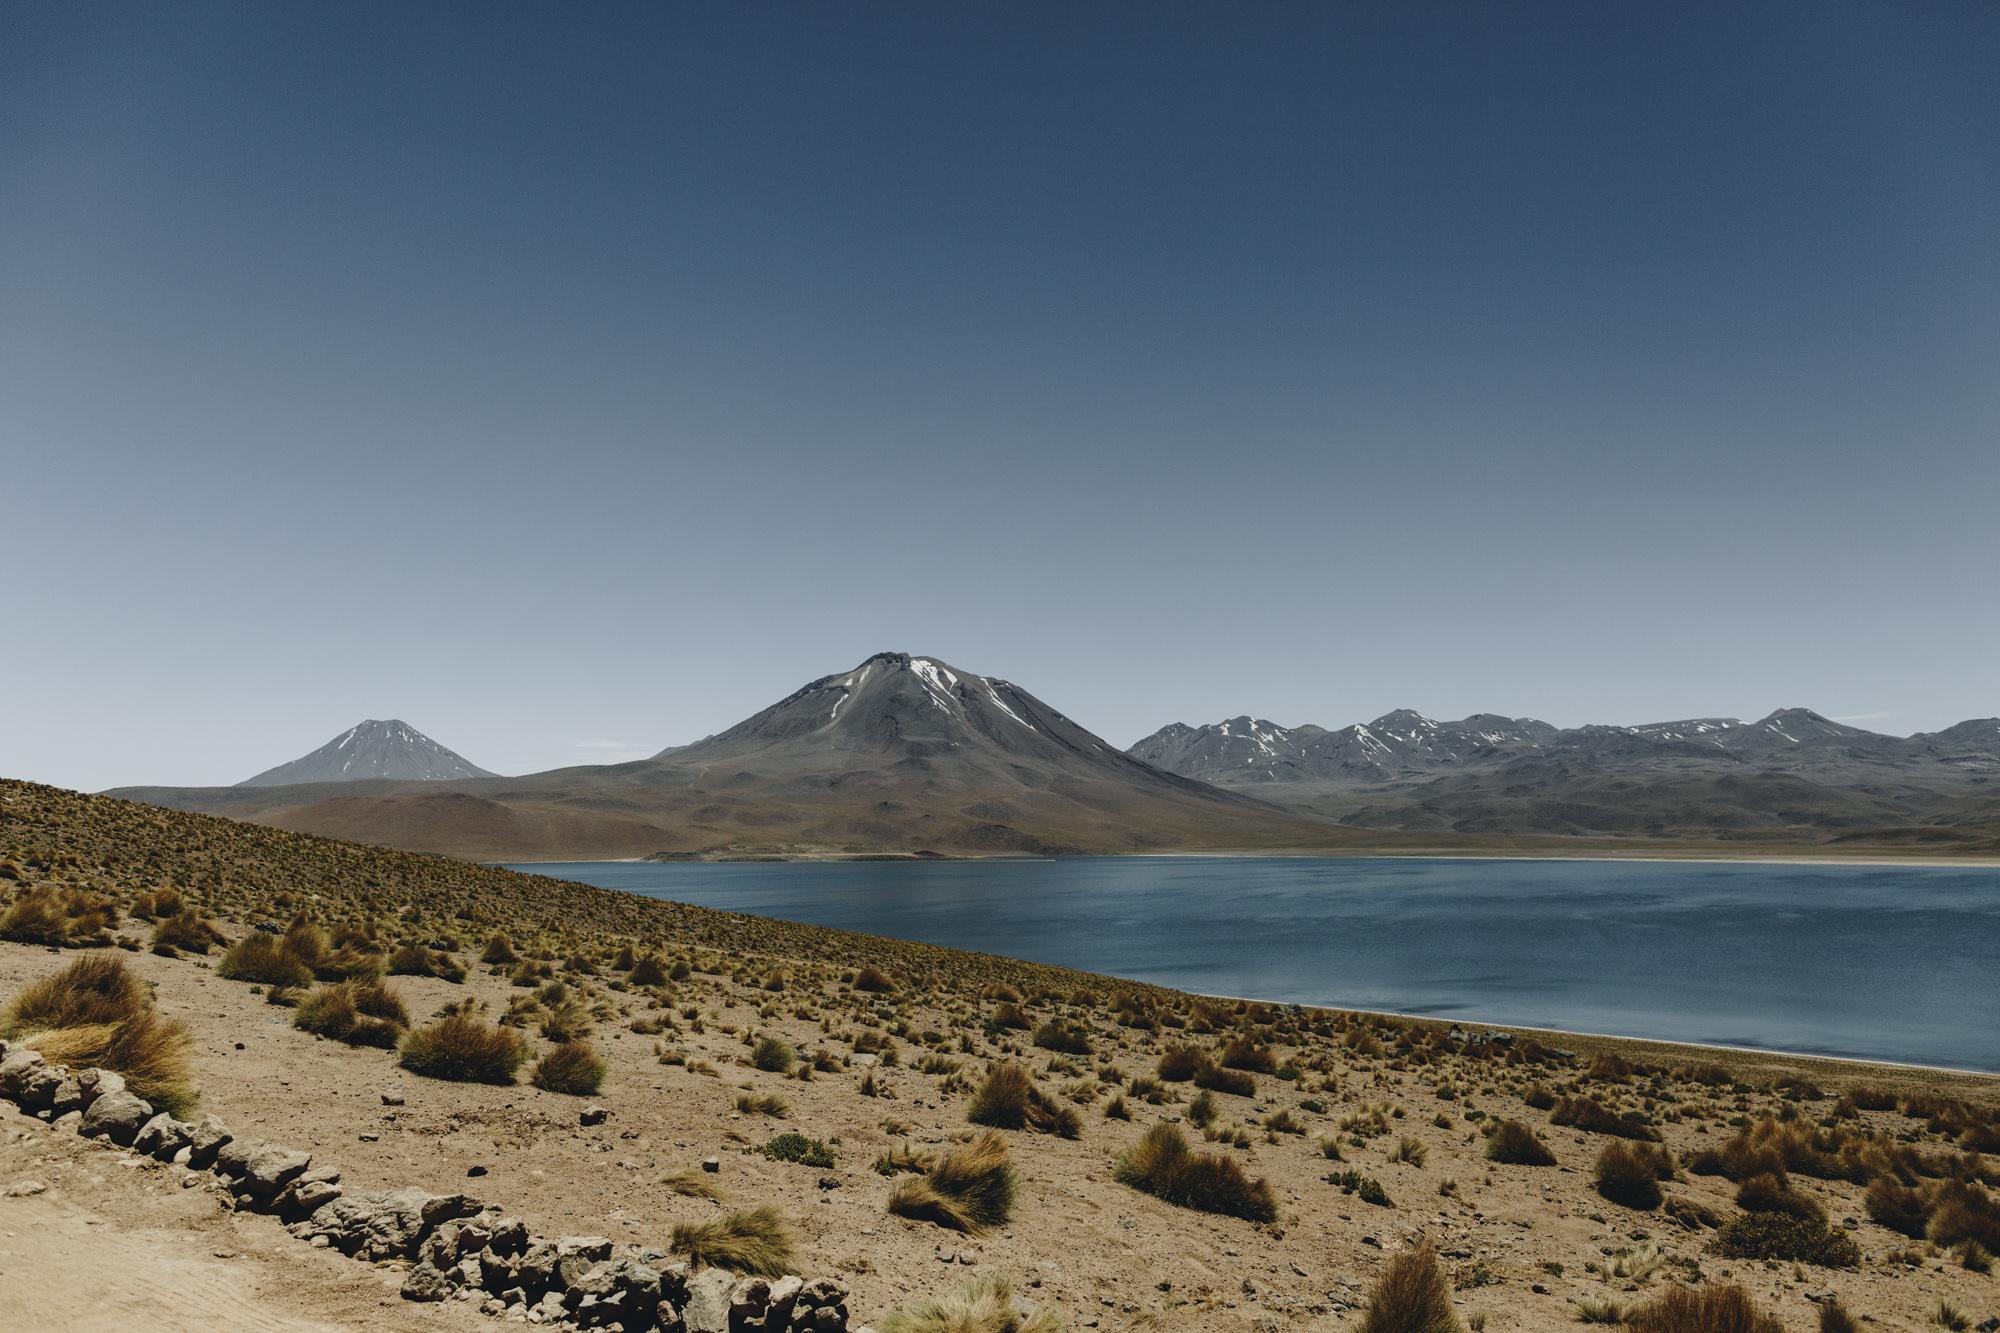 Mael Lambla photographer Chile San pedro atacama desert-229.jpg